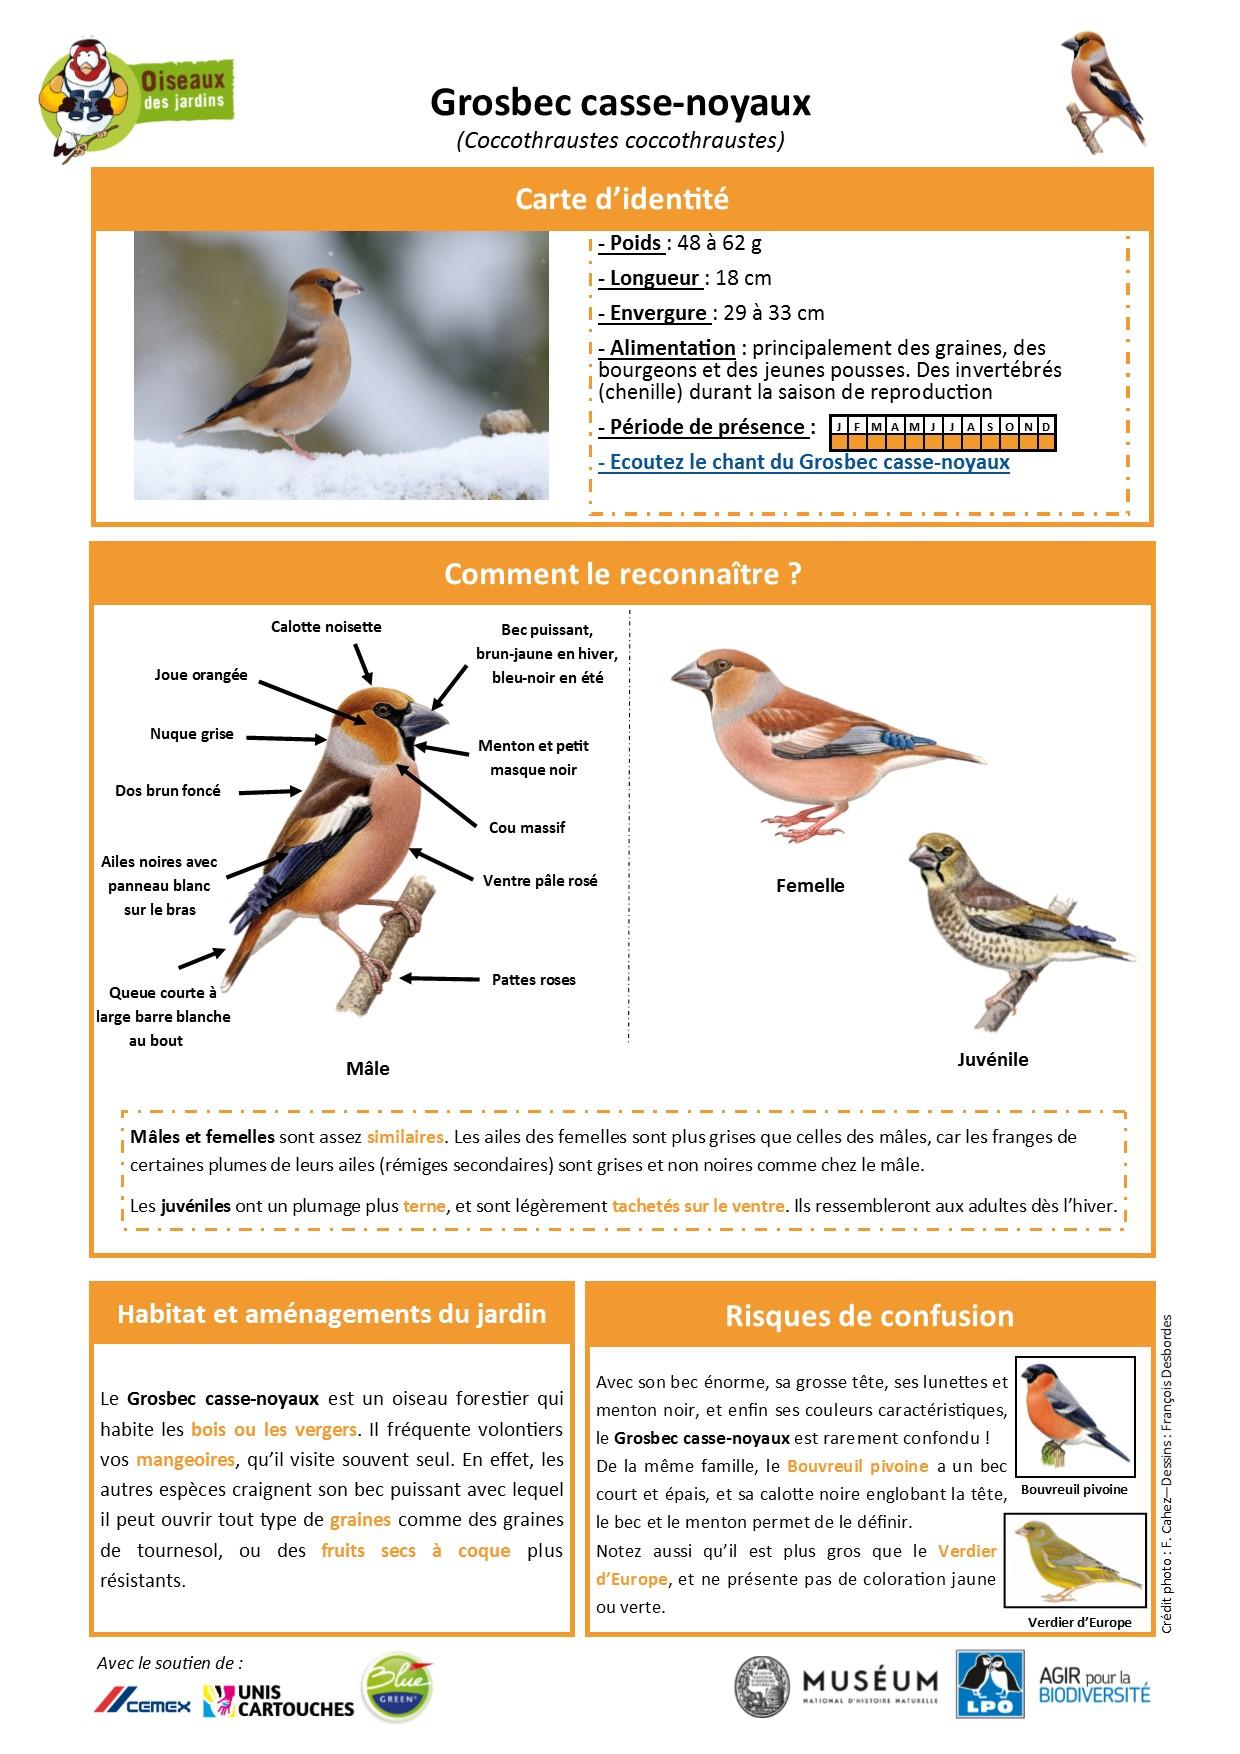 https://cdnfiles1.biolovision.net/www.oiseauxdesjardins.fr/userfiles/Fichesespces/FicheespceGB.pdf